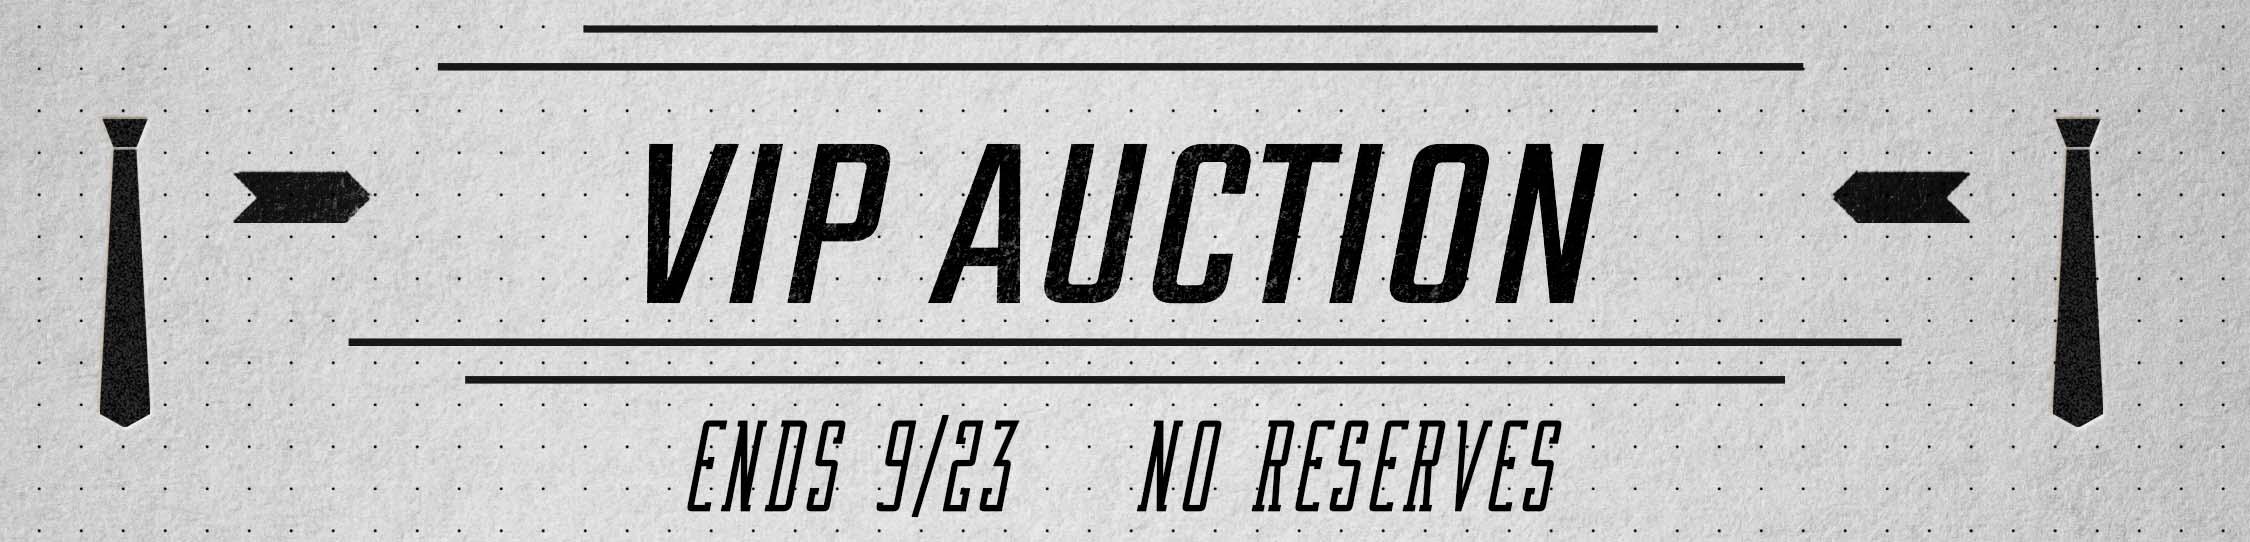 VIP Auction